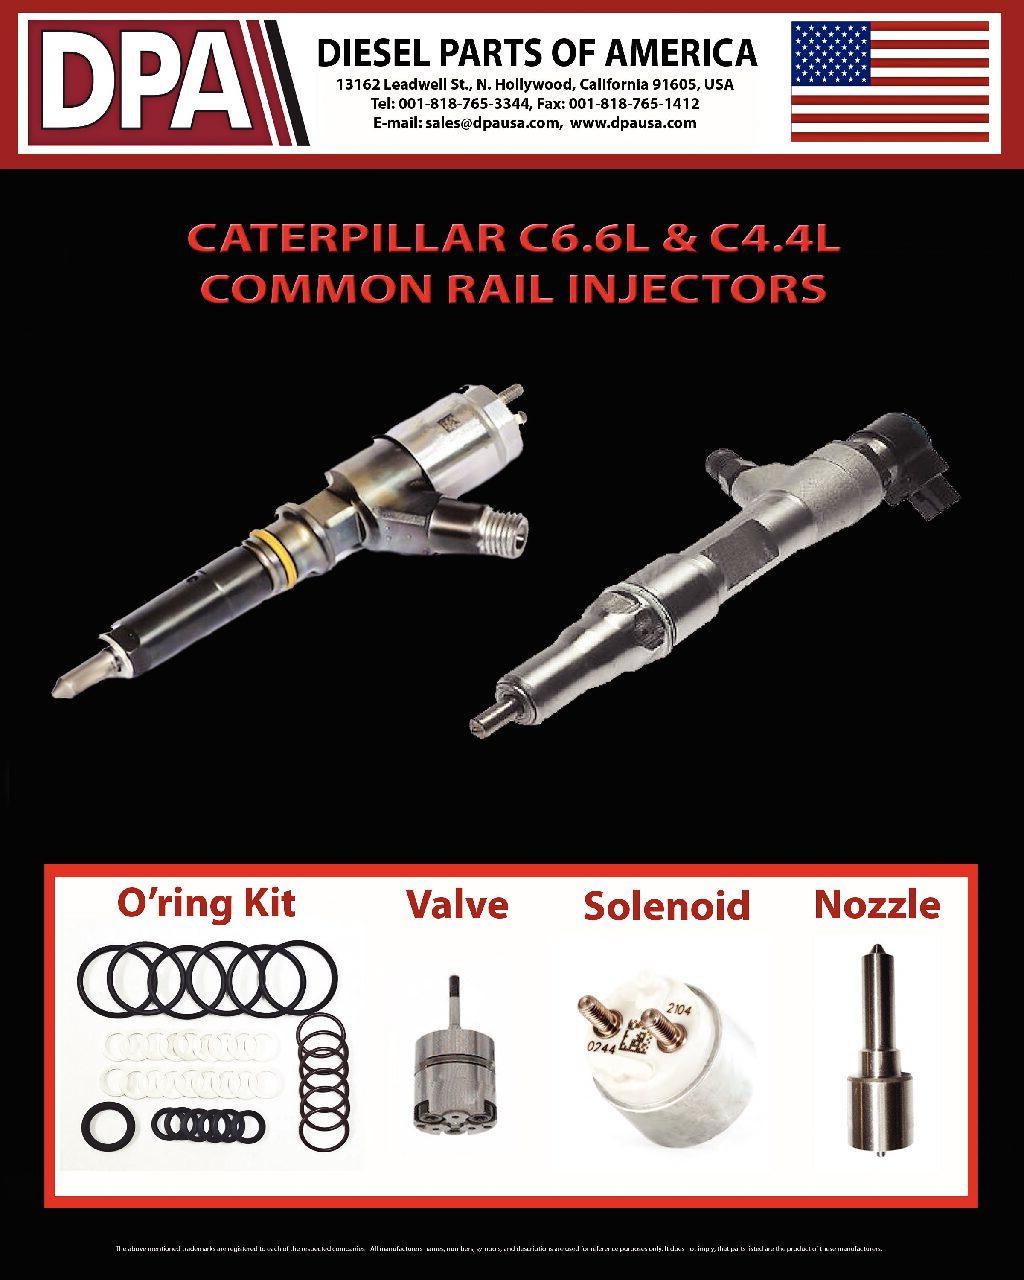 dpa_common_rail_cat_c6_6_c4_4-pdf.jpg